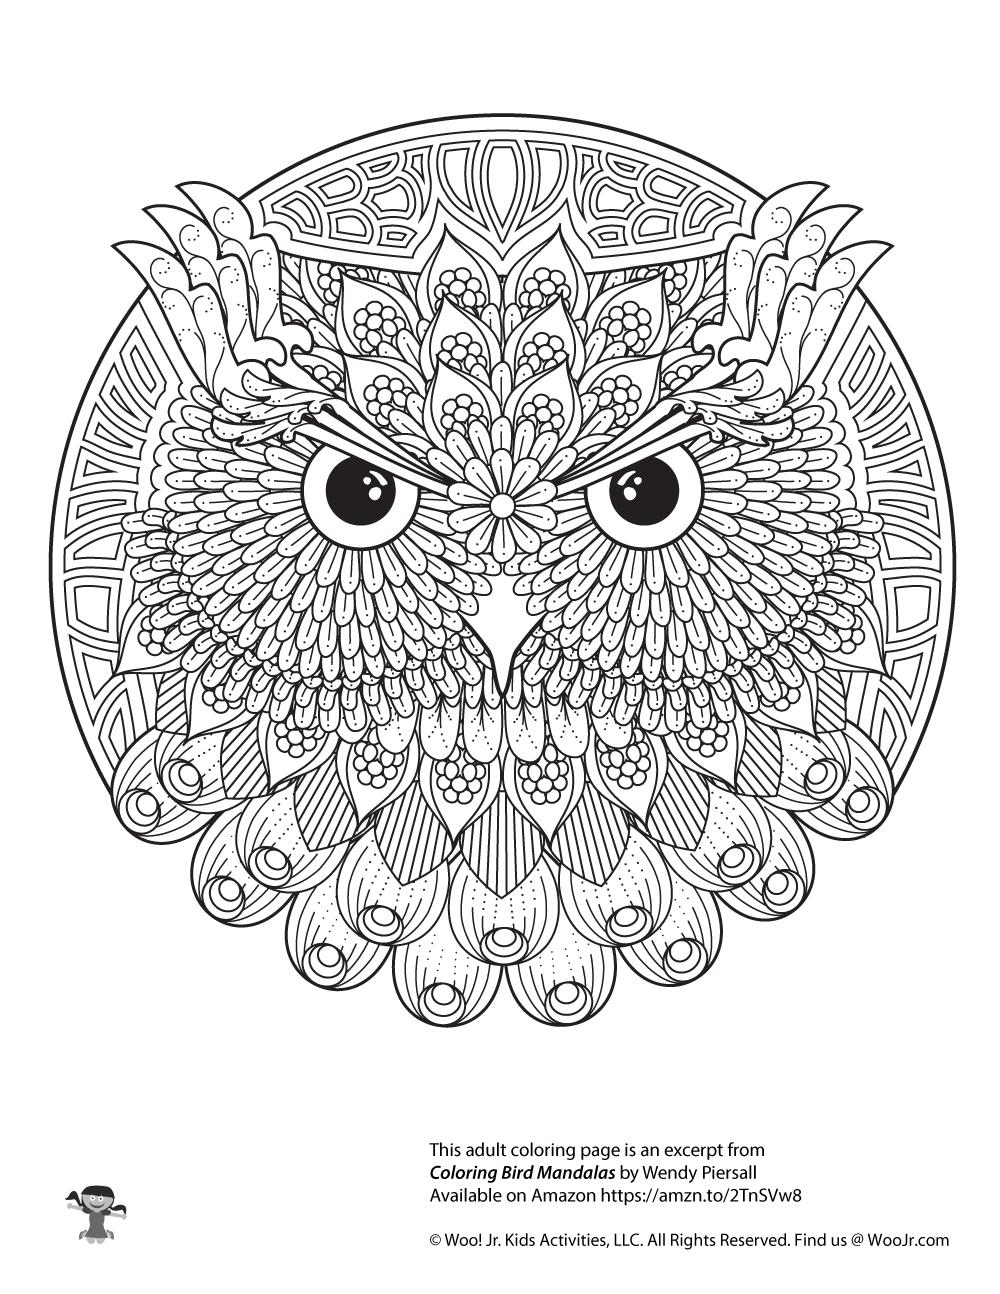 Owl Adult Mandala Coloring Page | Woo! Jr. Kids Activities